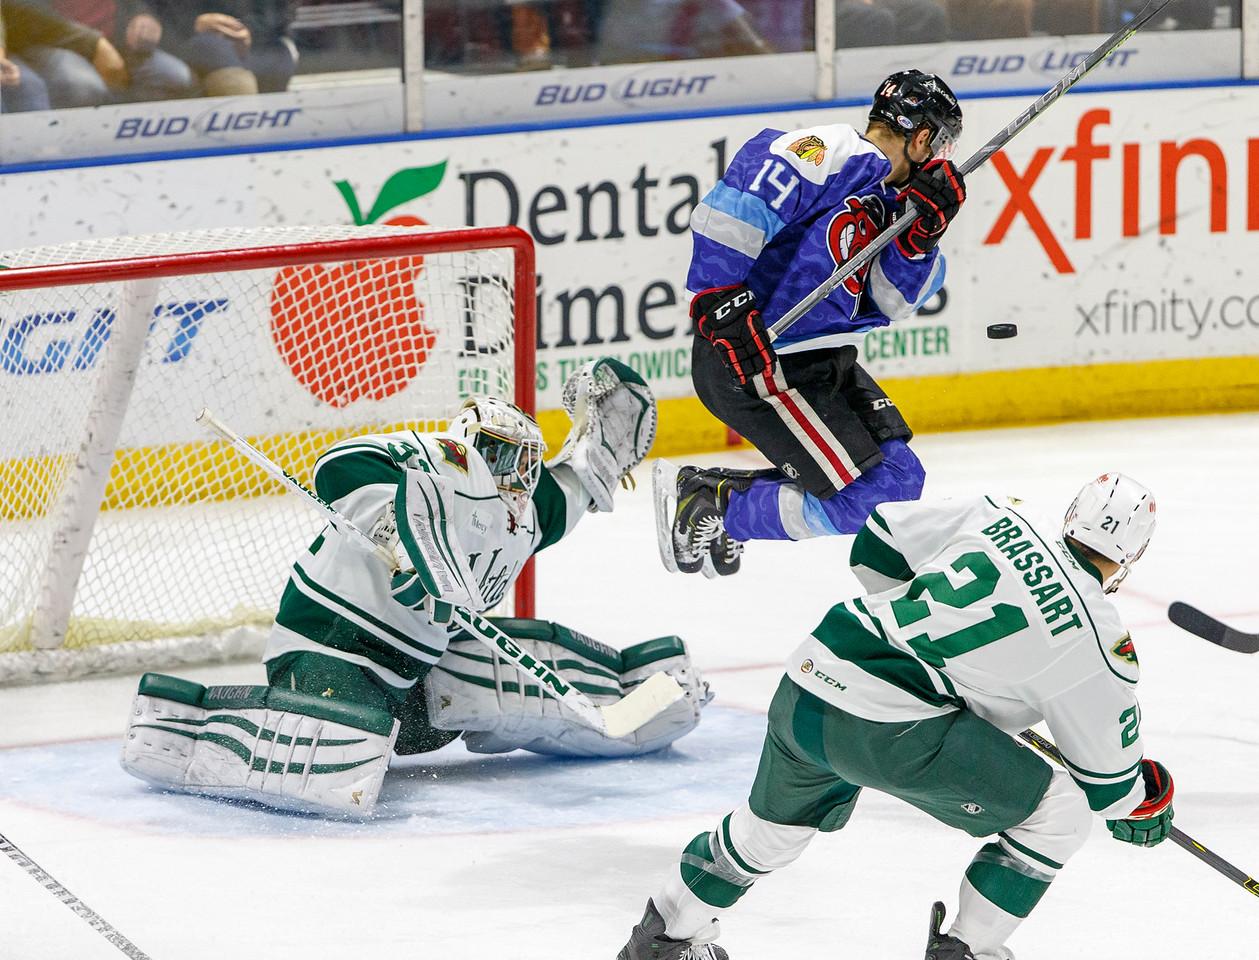 IMAGE: http://www.reicherstudios.com/Sports/HockeyPhotos/IceHogs-20142015/IceHogs-vs-Wild-11-26-14/i-wJW5r3r/0/X2/CC6Q7388-X2.jpg